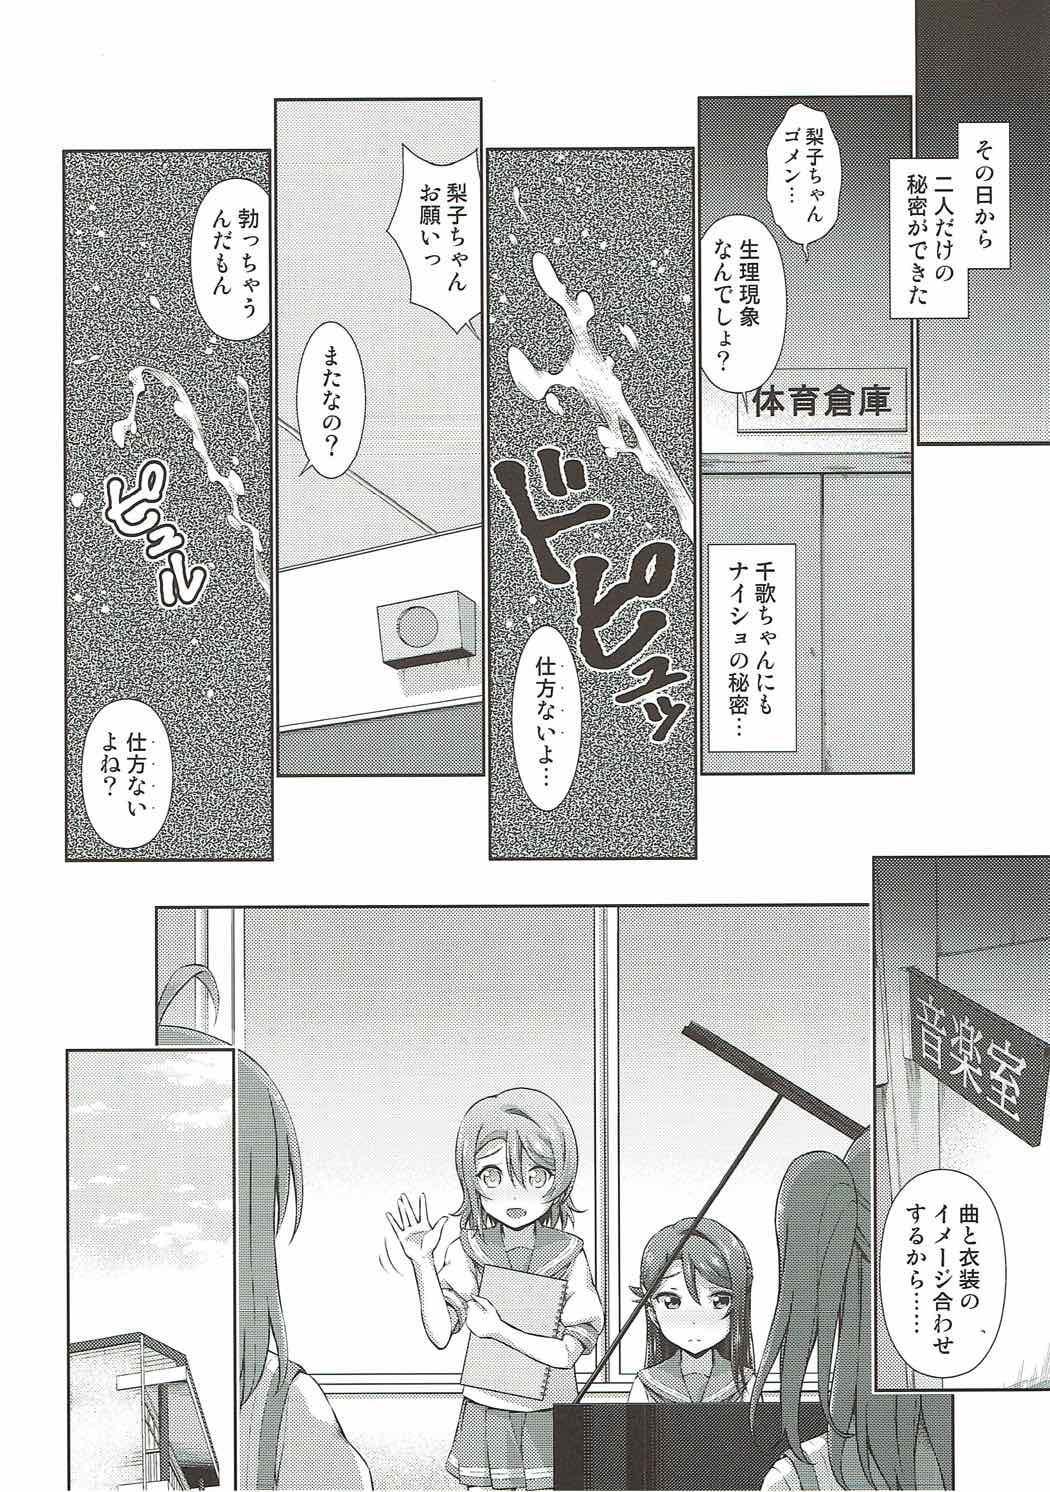 Chika-chan ni mo Naisho no Himitsu 36